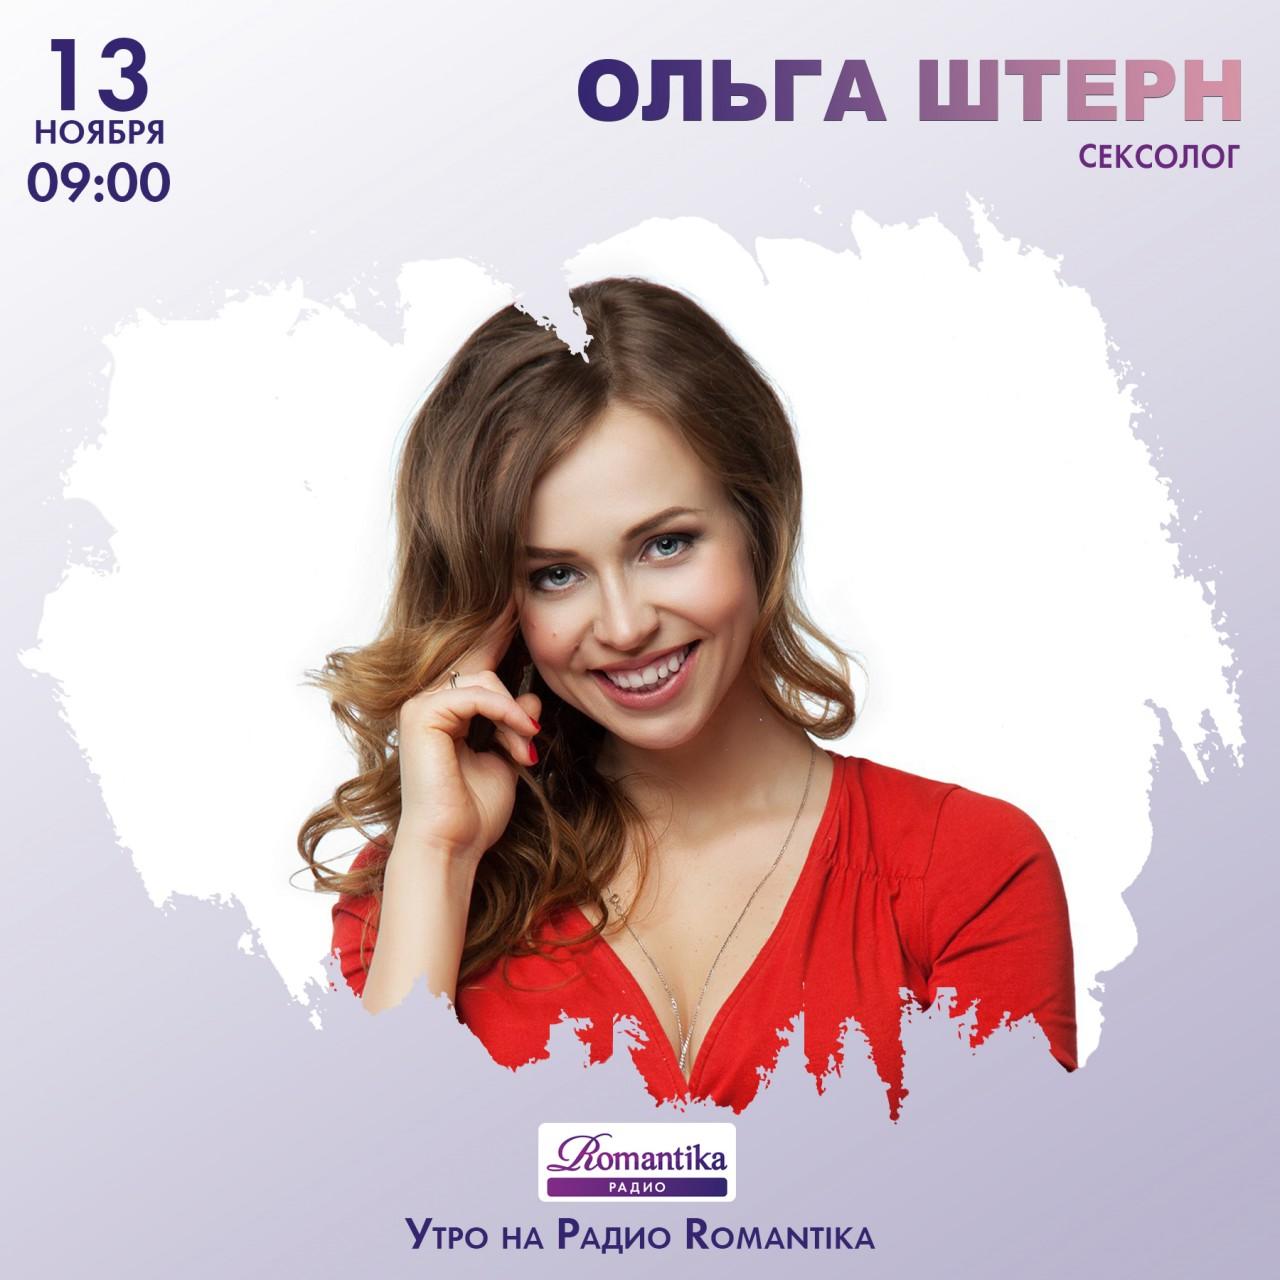 Радио Romantika: 13 ноября 9…